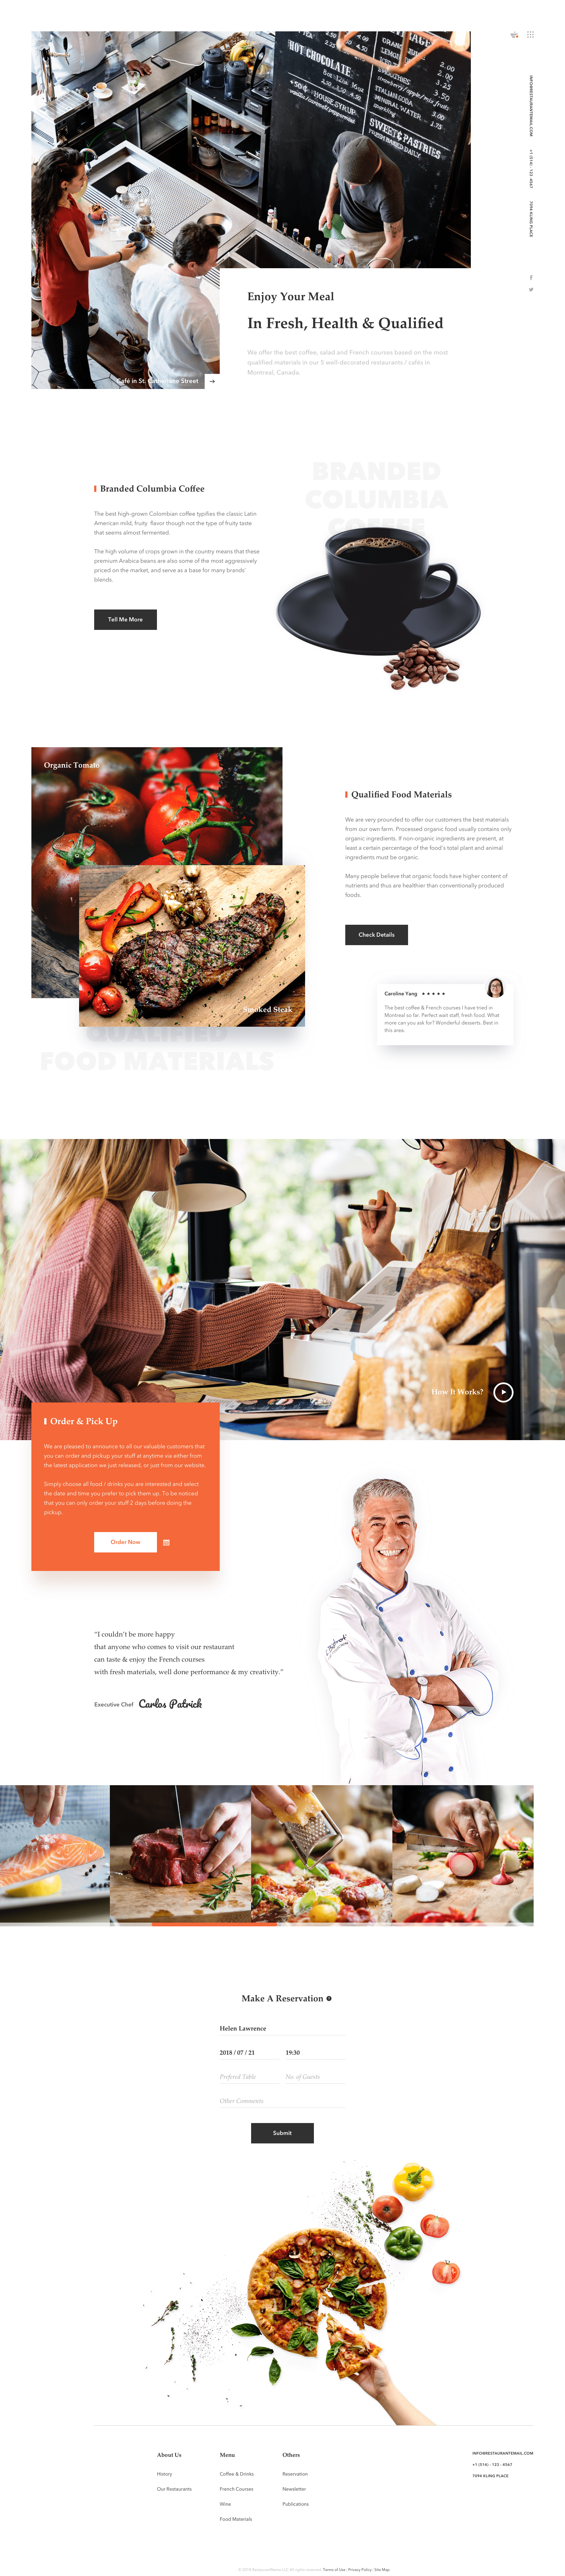 Cafe Website Design Example #2